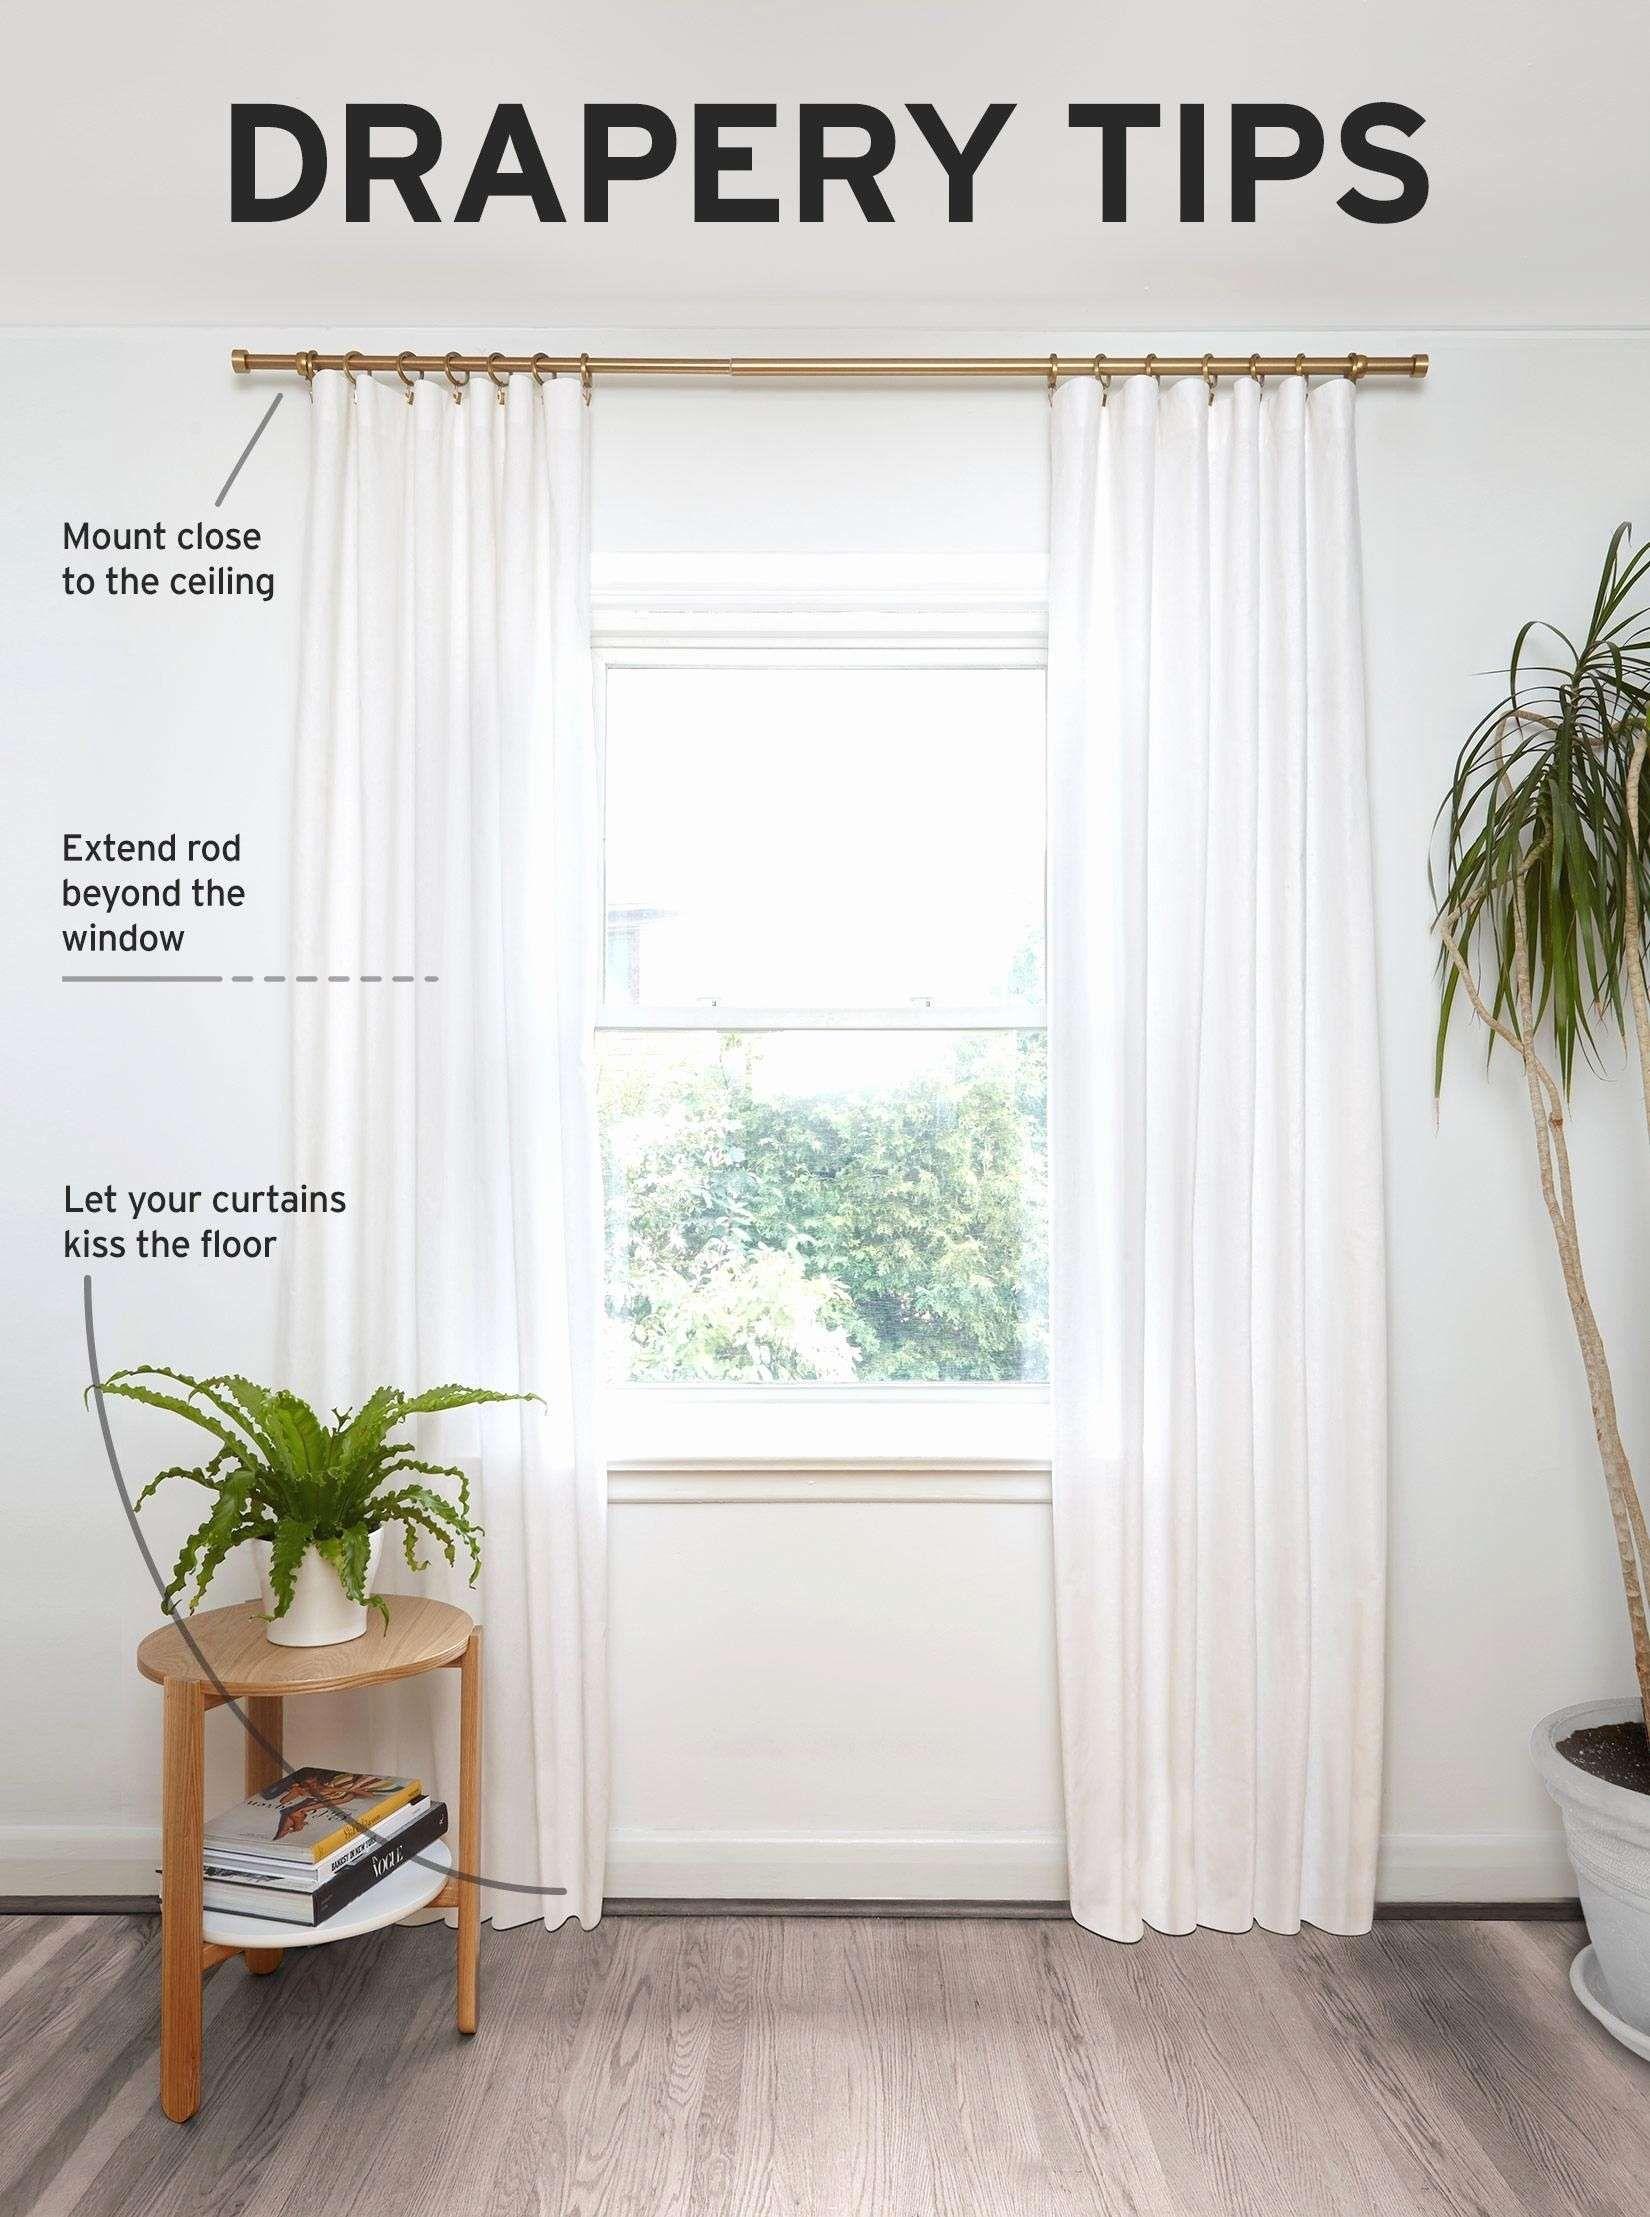 Best Of Decorative Garden Post Curtains Inside Window Frame